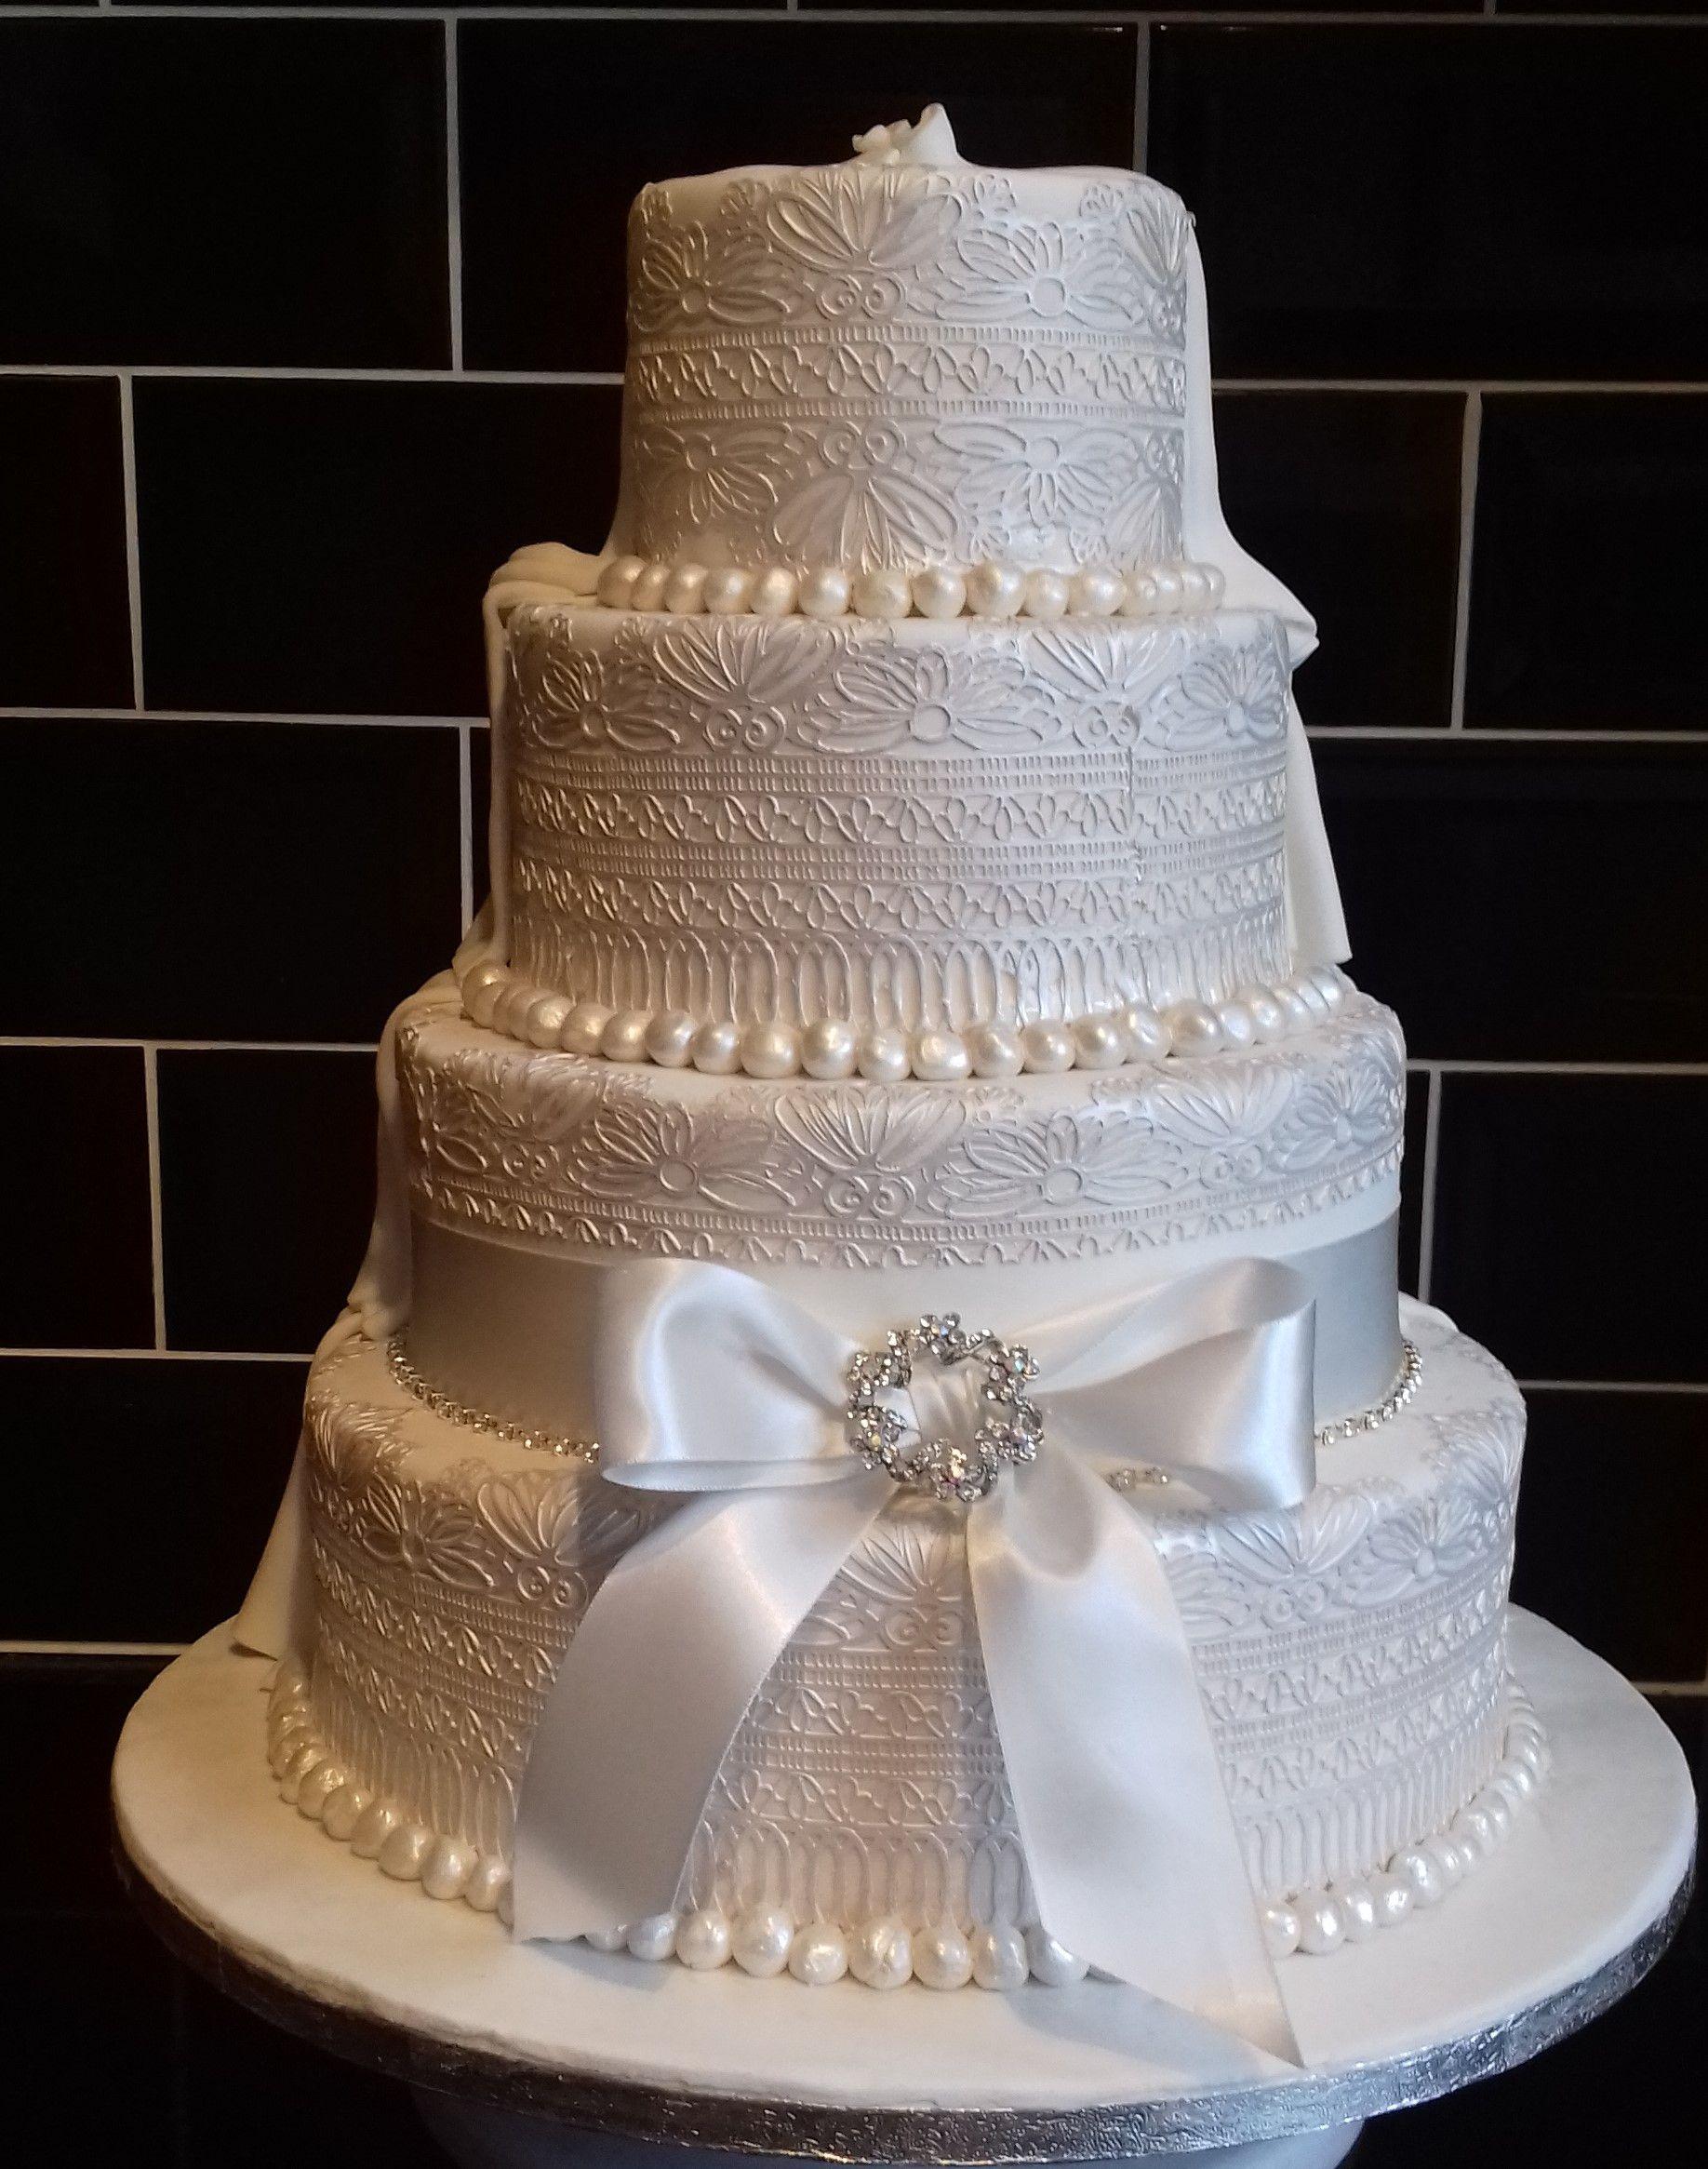 Cakes Unlimited Wedding Cakes  - Vintage Lace, Superhero half and half wedding cake